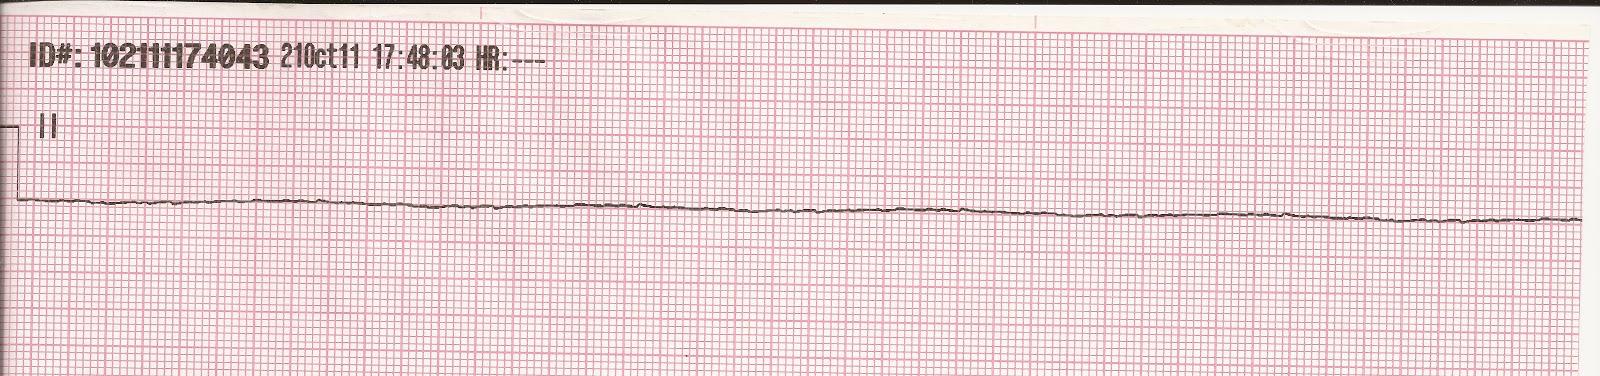 P Wave Asystole Float Nurse: Basic ECG...